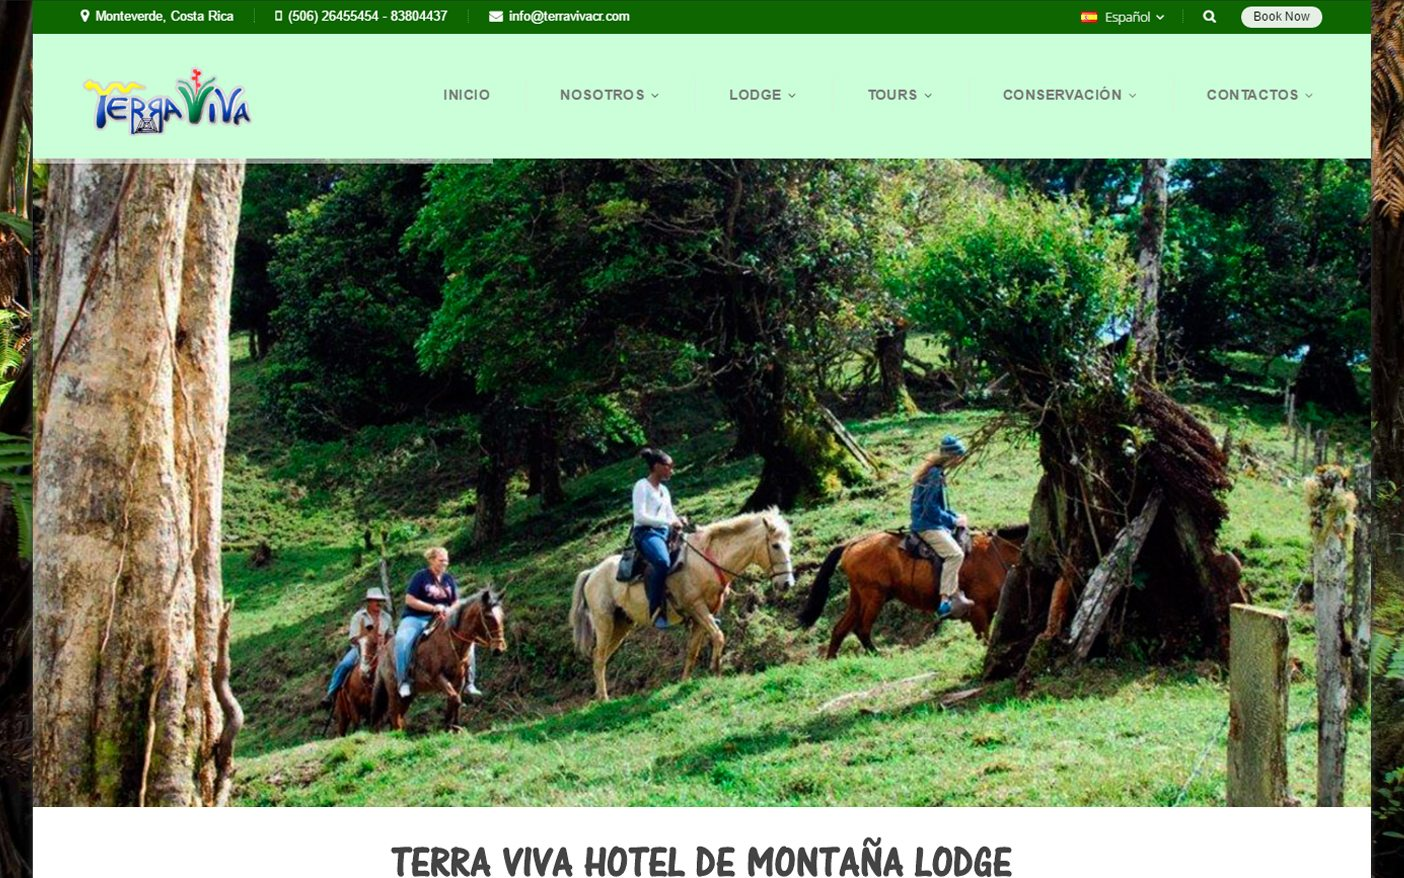 Terra Viva, Santa Elena, Monteverde, Costa Rica